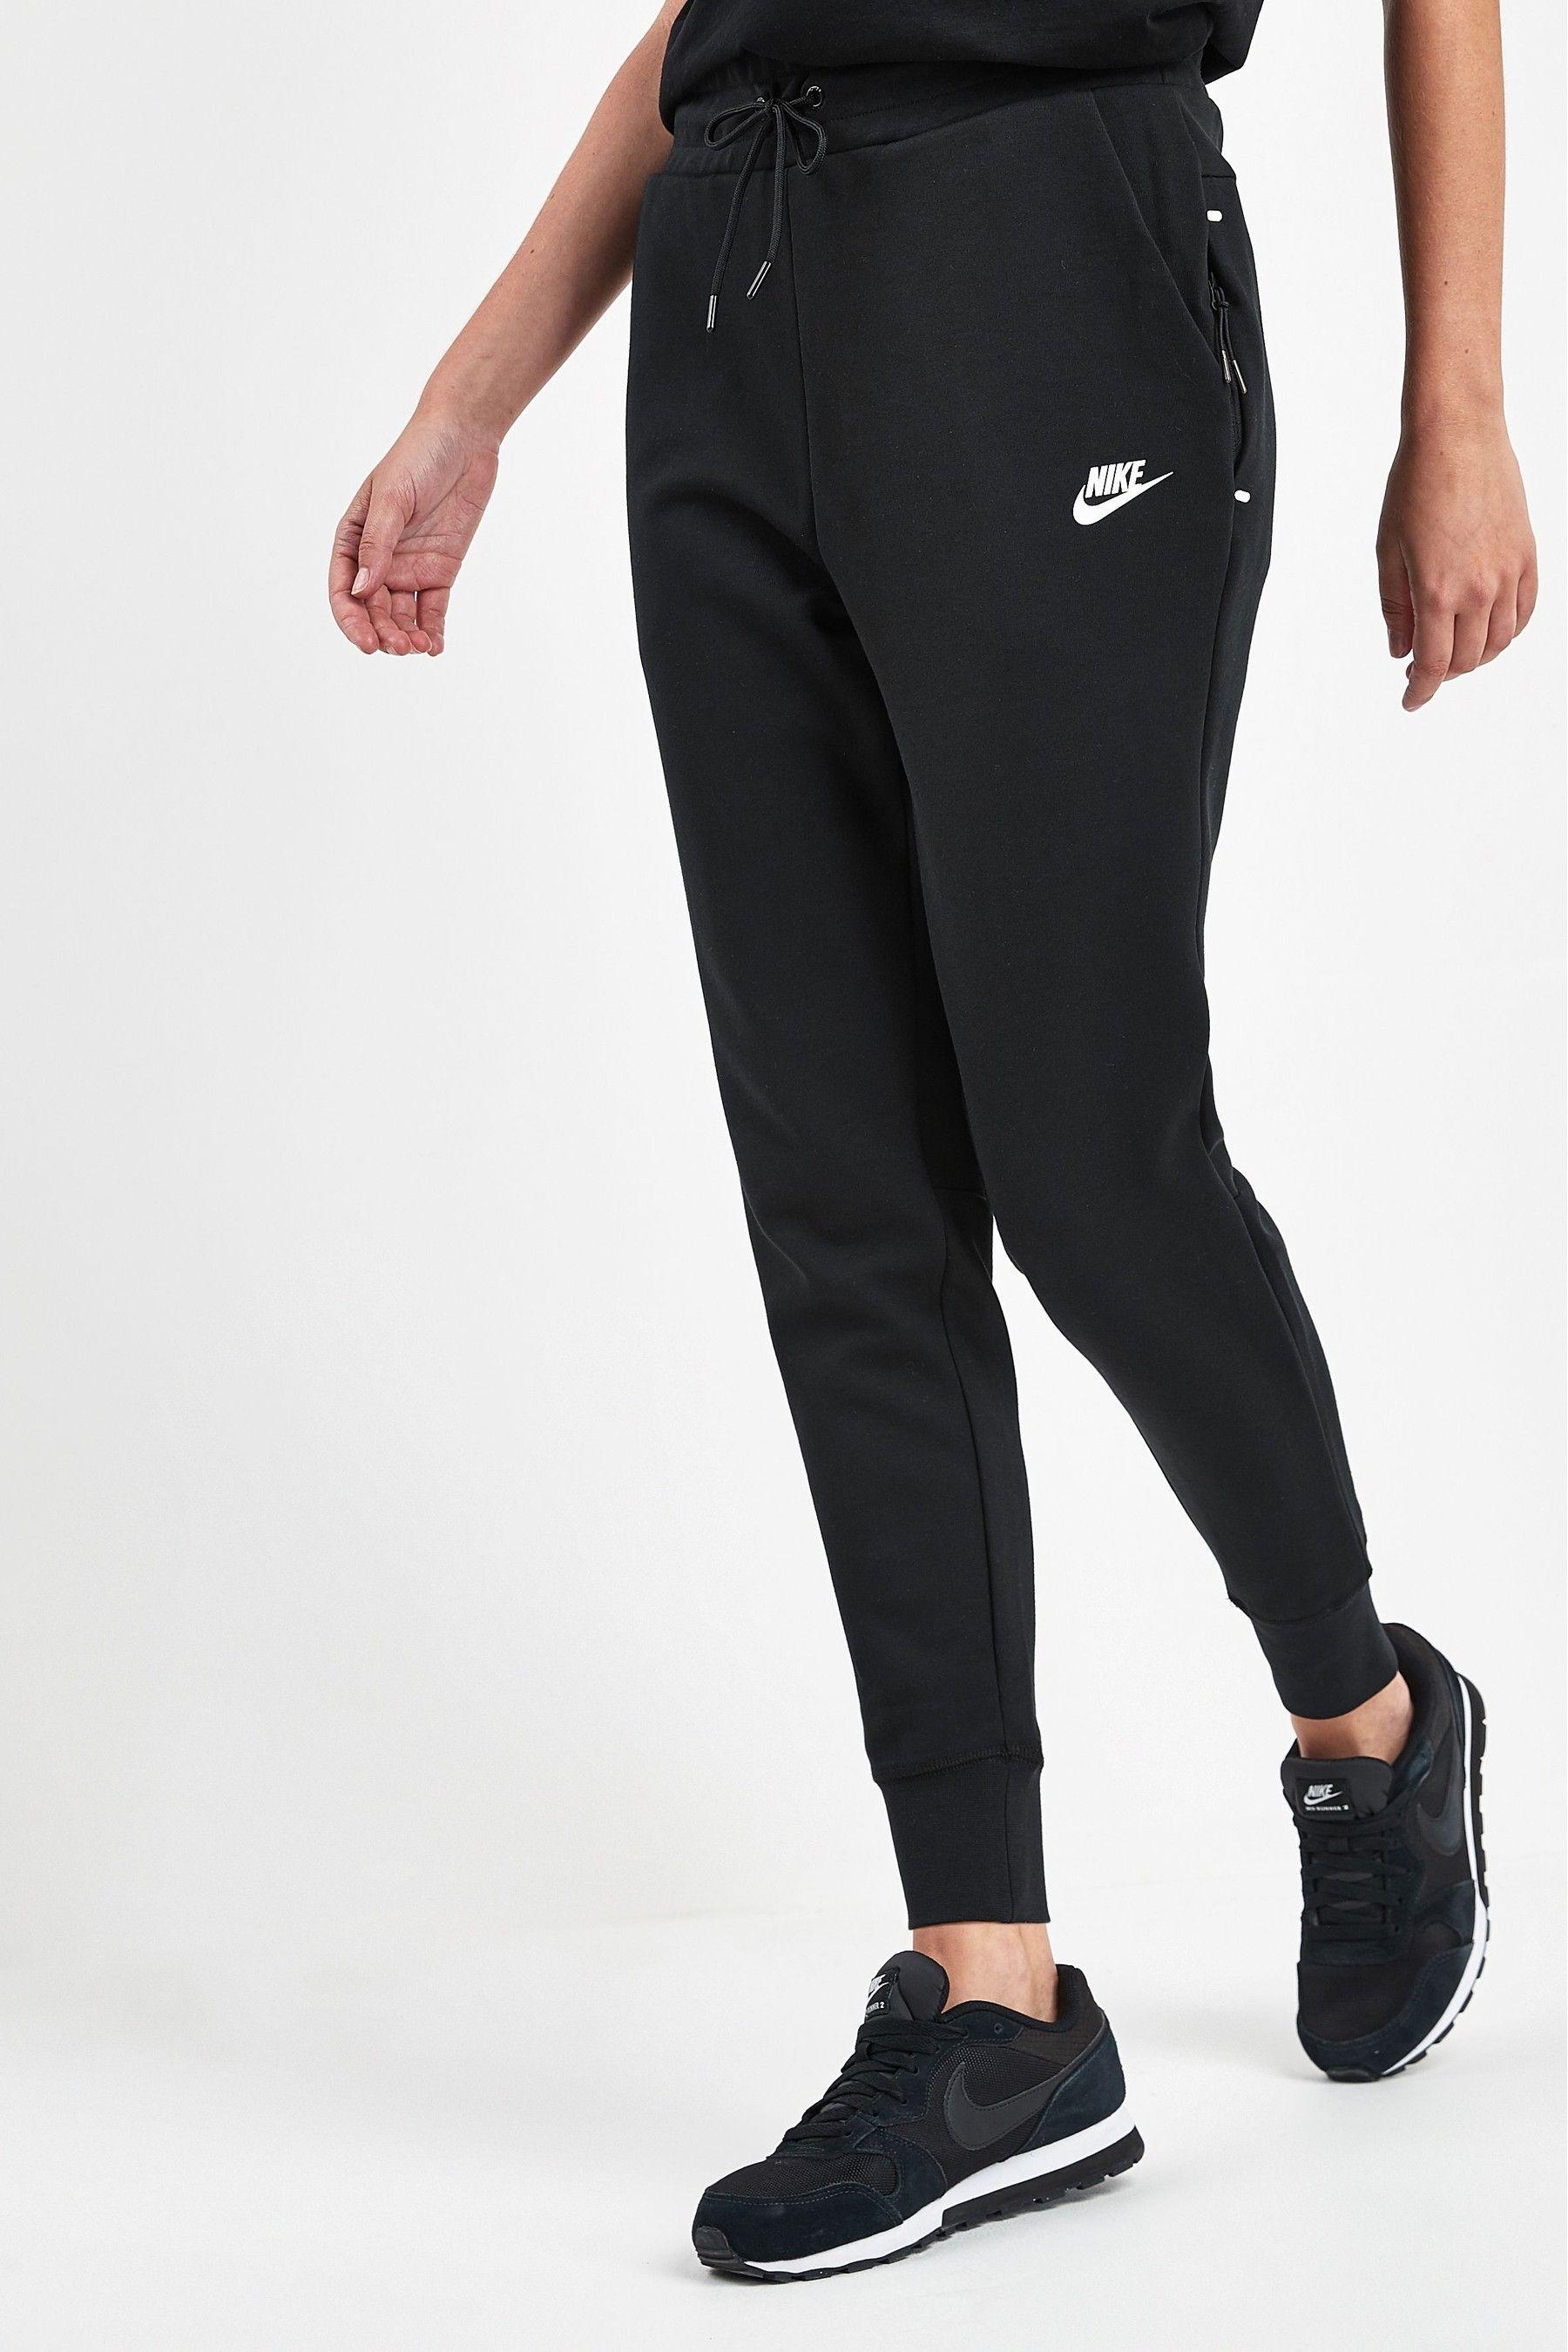 Womens Nike Tech Fleece Joggers - Black | Nike tech fleece ...